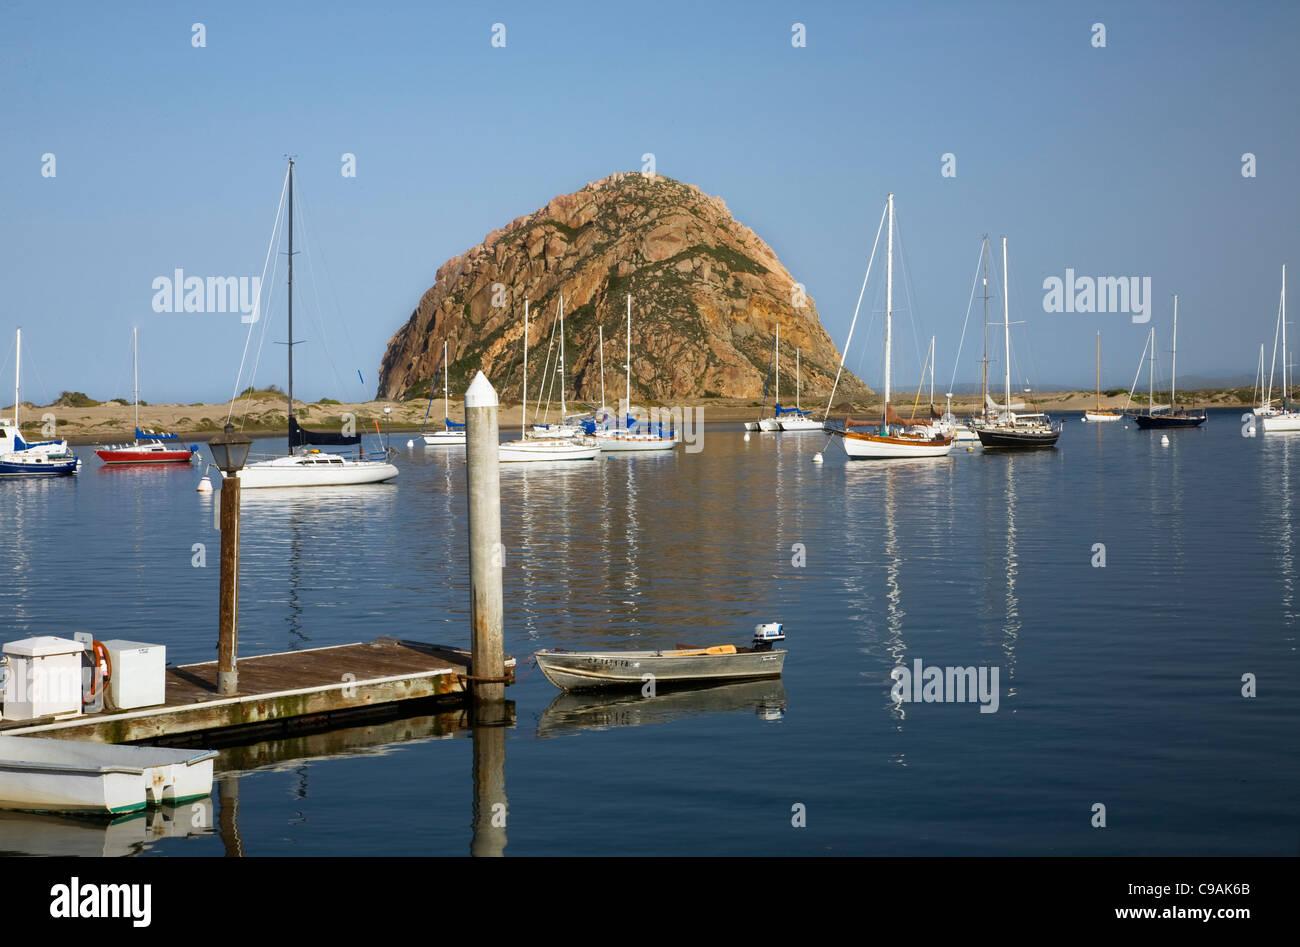 CALIFORNIA - Morro Rock and boats anchored in Morro Bay. - Stock Image